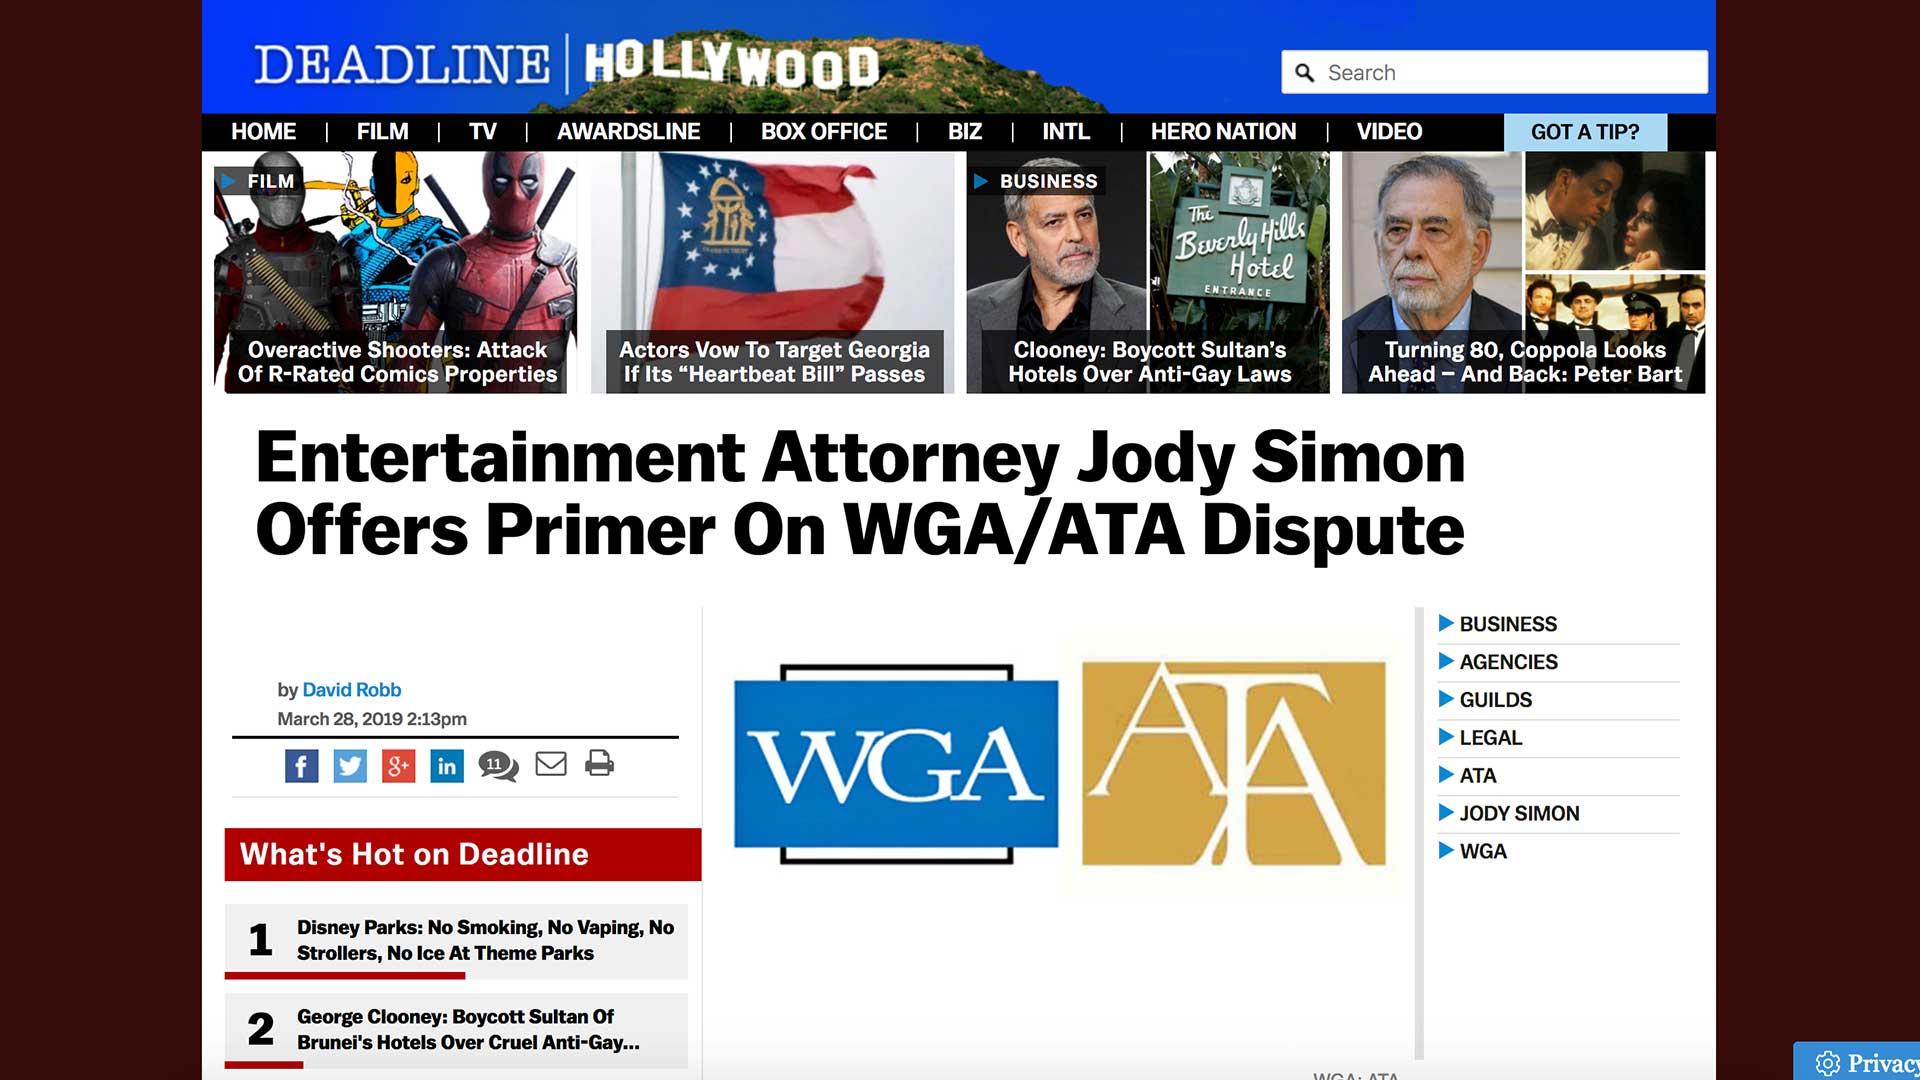 Fairness Rocks News Entertainment Attorney Jody Simon Offers Primer On WGA/ATA Dispute